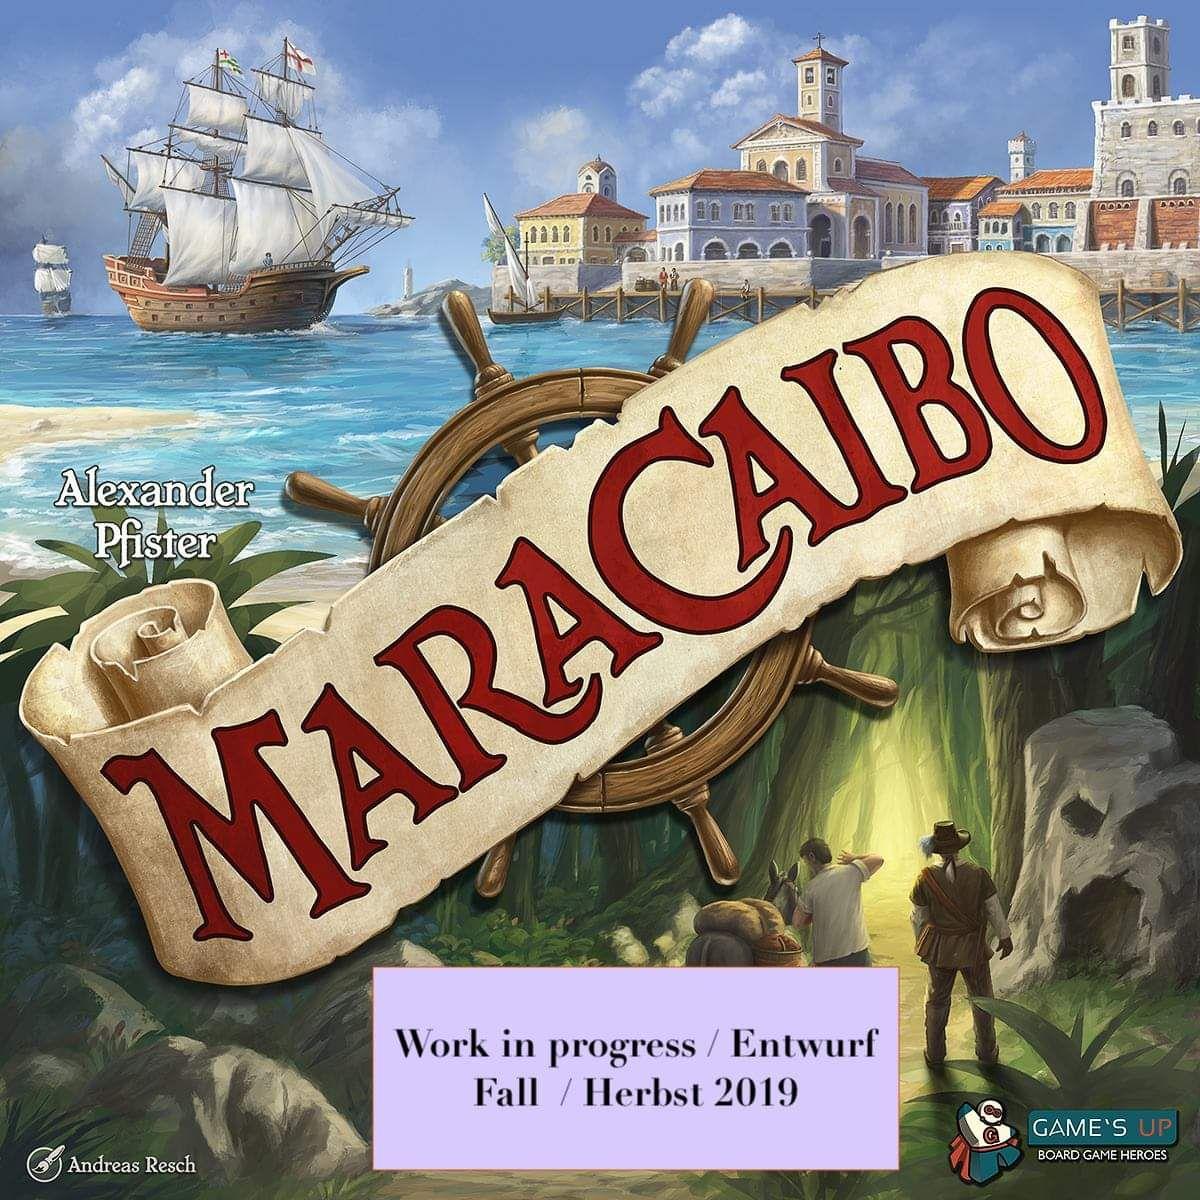 Novedades Mayo 2020 - Maracaibo